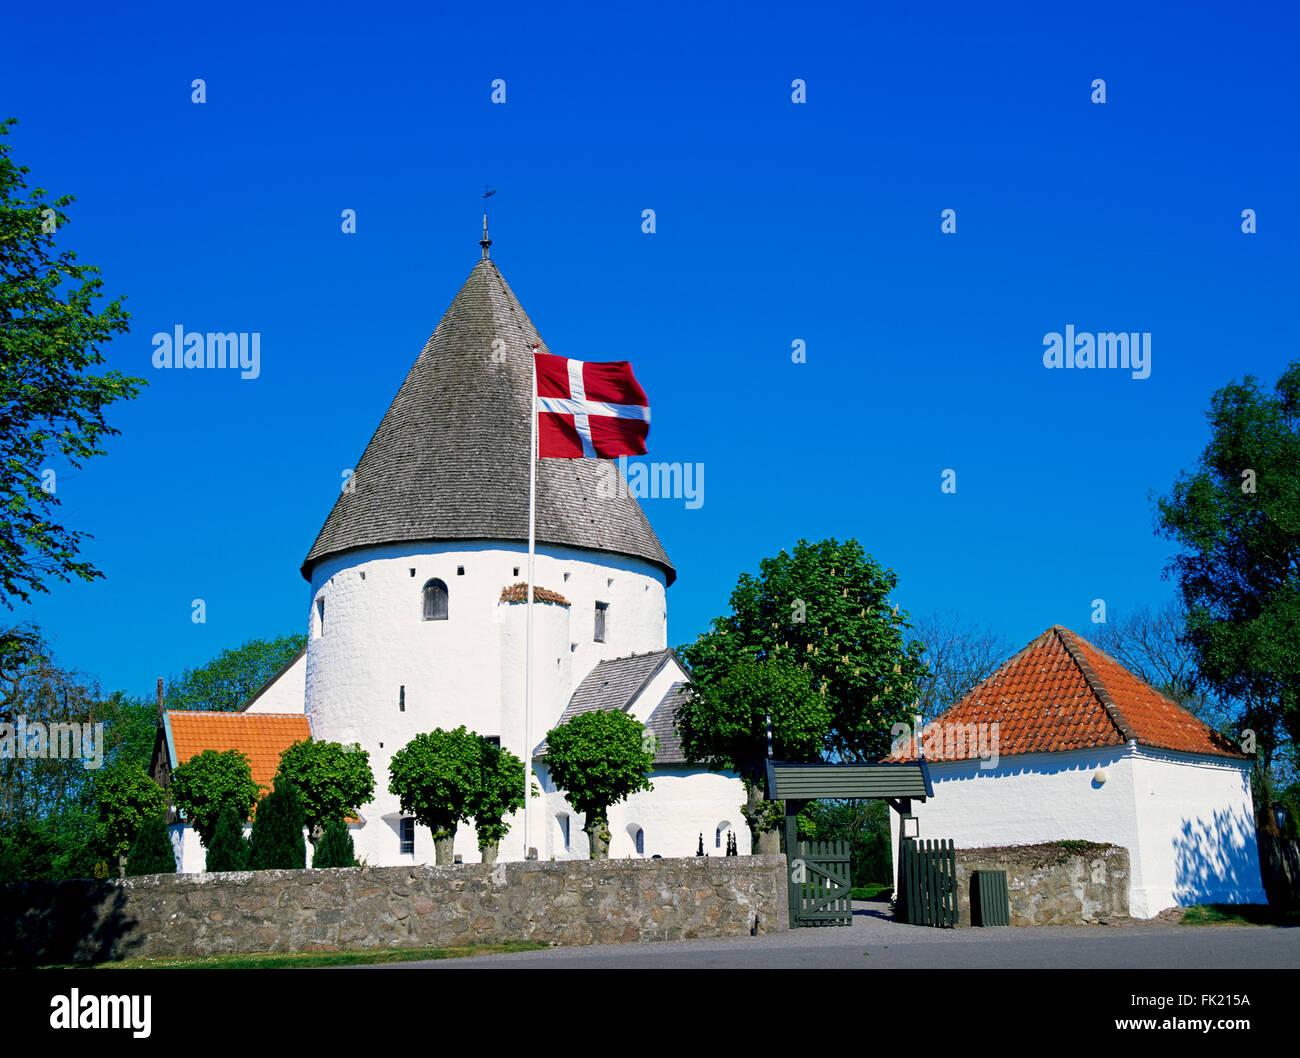 Round church Ols Kirche, Olsker, Bornholm island, Denmark, Scandinavia, Europe - Stock Image